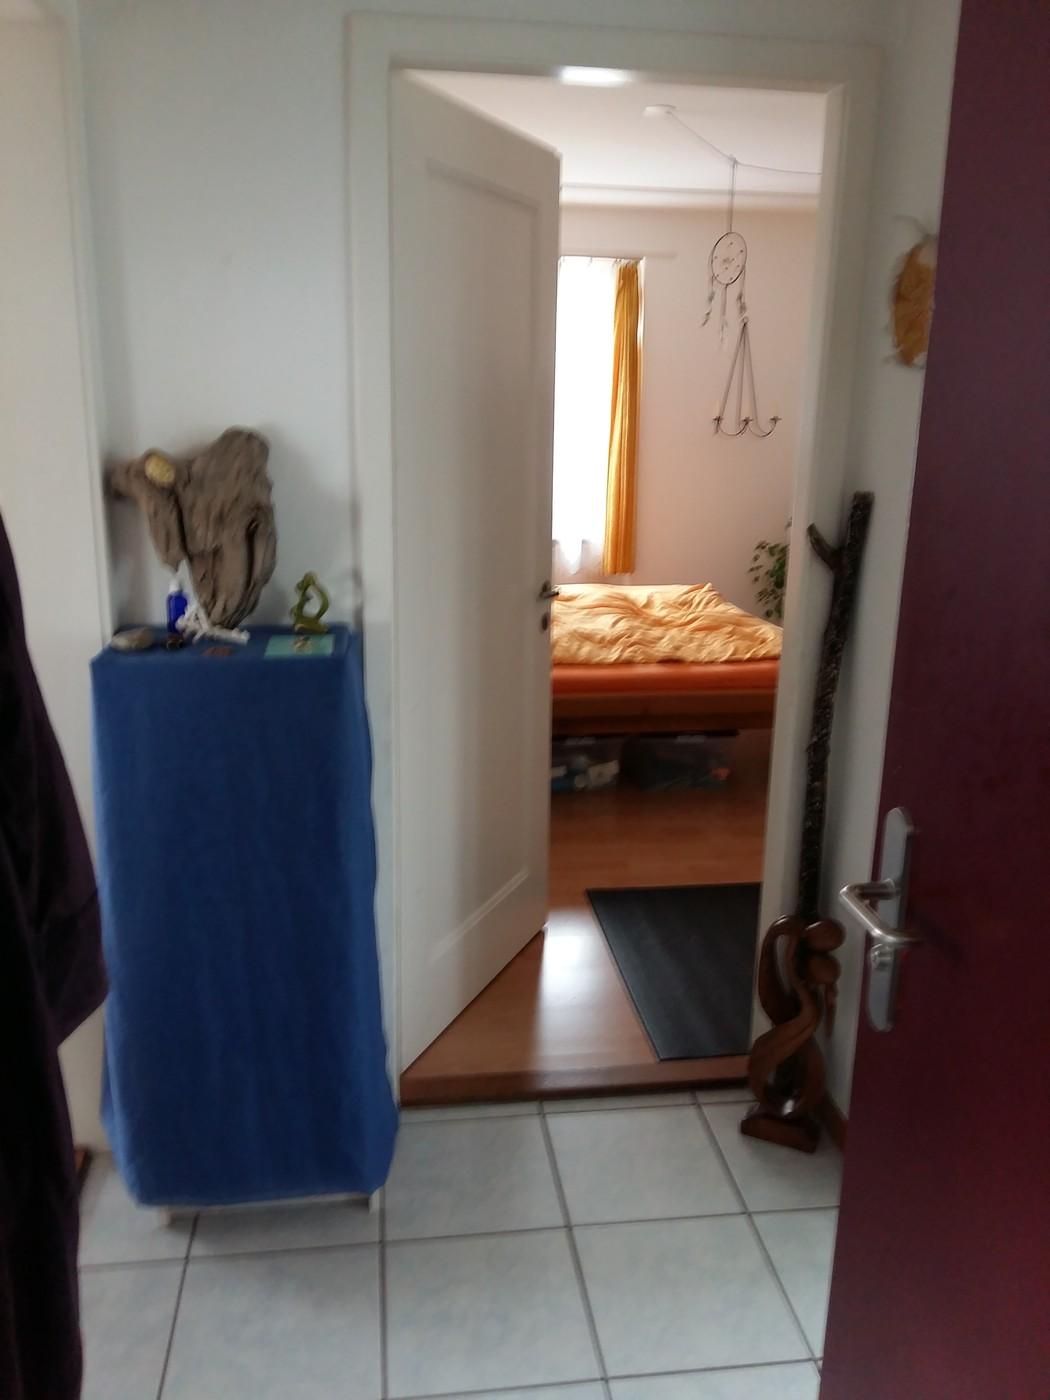 2 zimmer wohnung in bremgarten b bern mieten flatfox. Black Bedroom Furniture Sets. Home Design Ideas